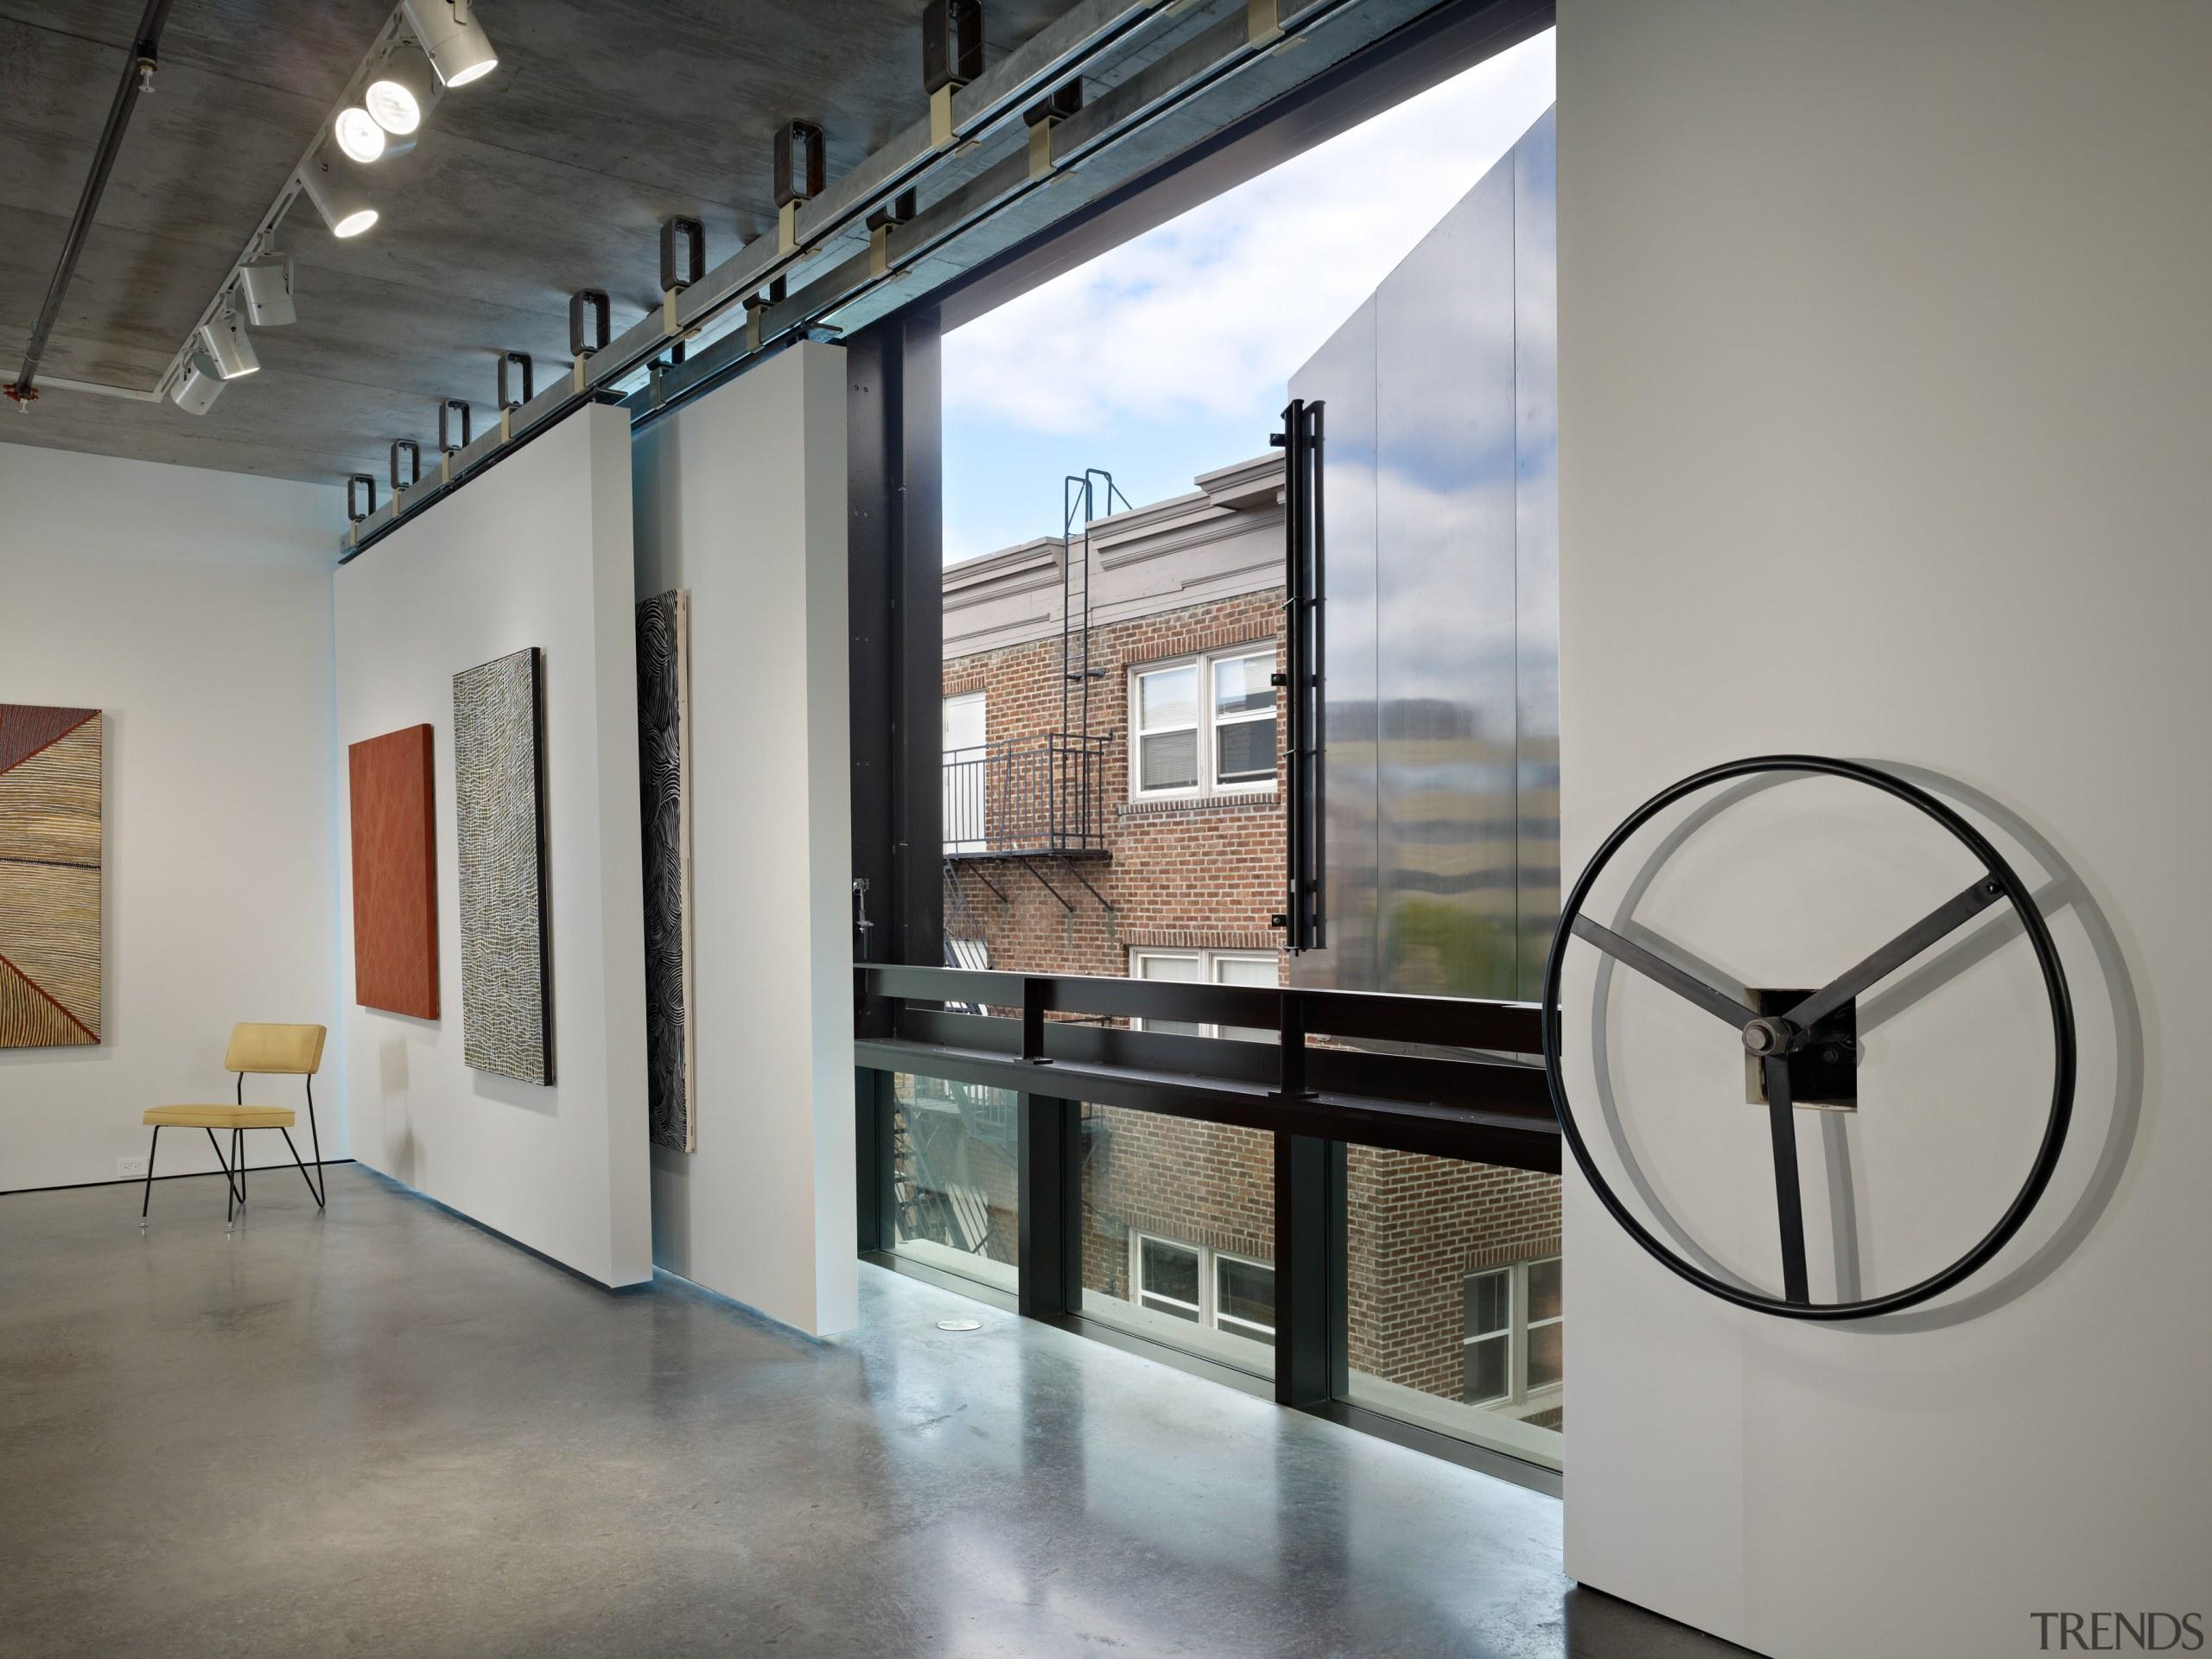 Interior with white walls and art. - Interior glass, interior design, gray